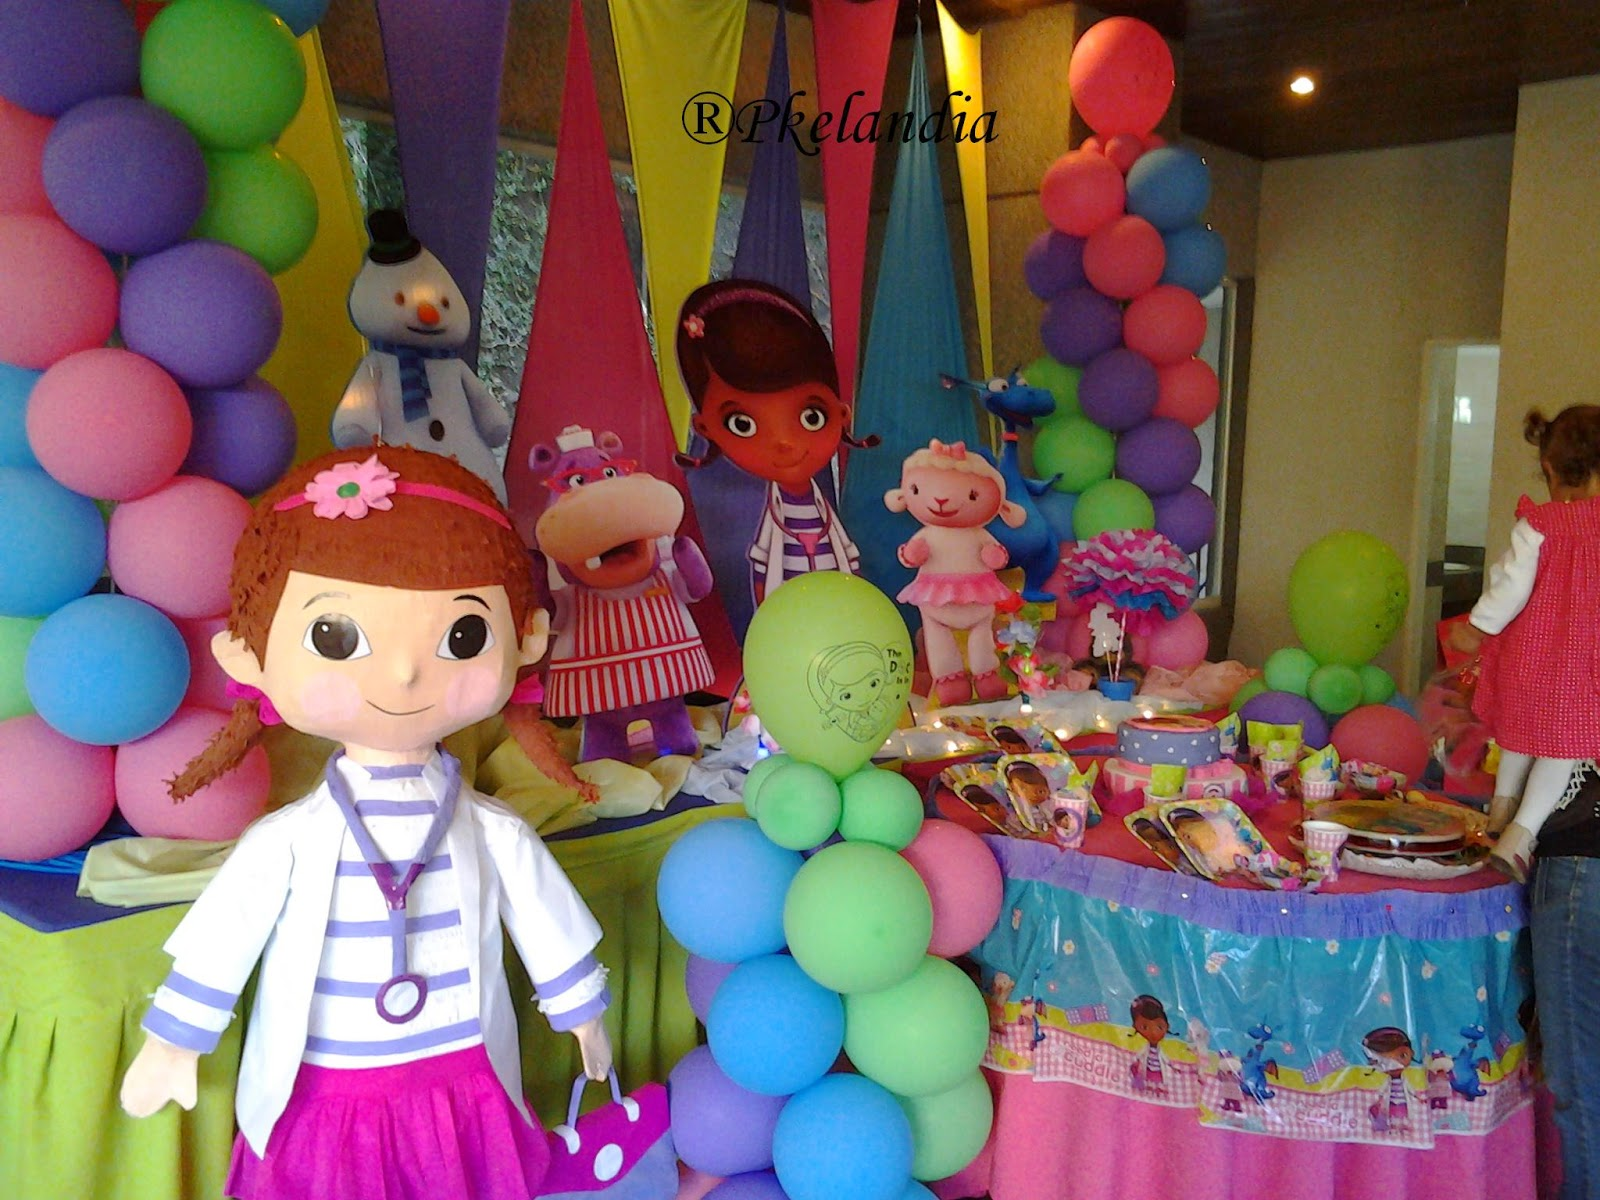 fiesta charla espectáculo de juguete